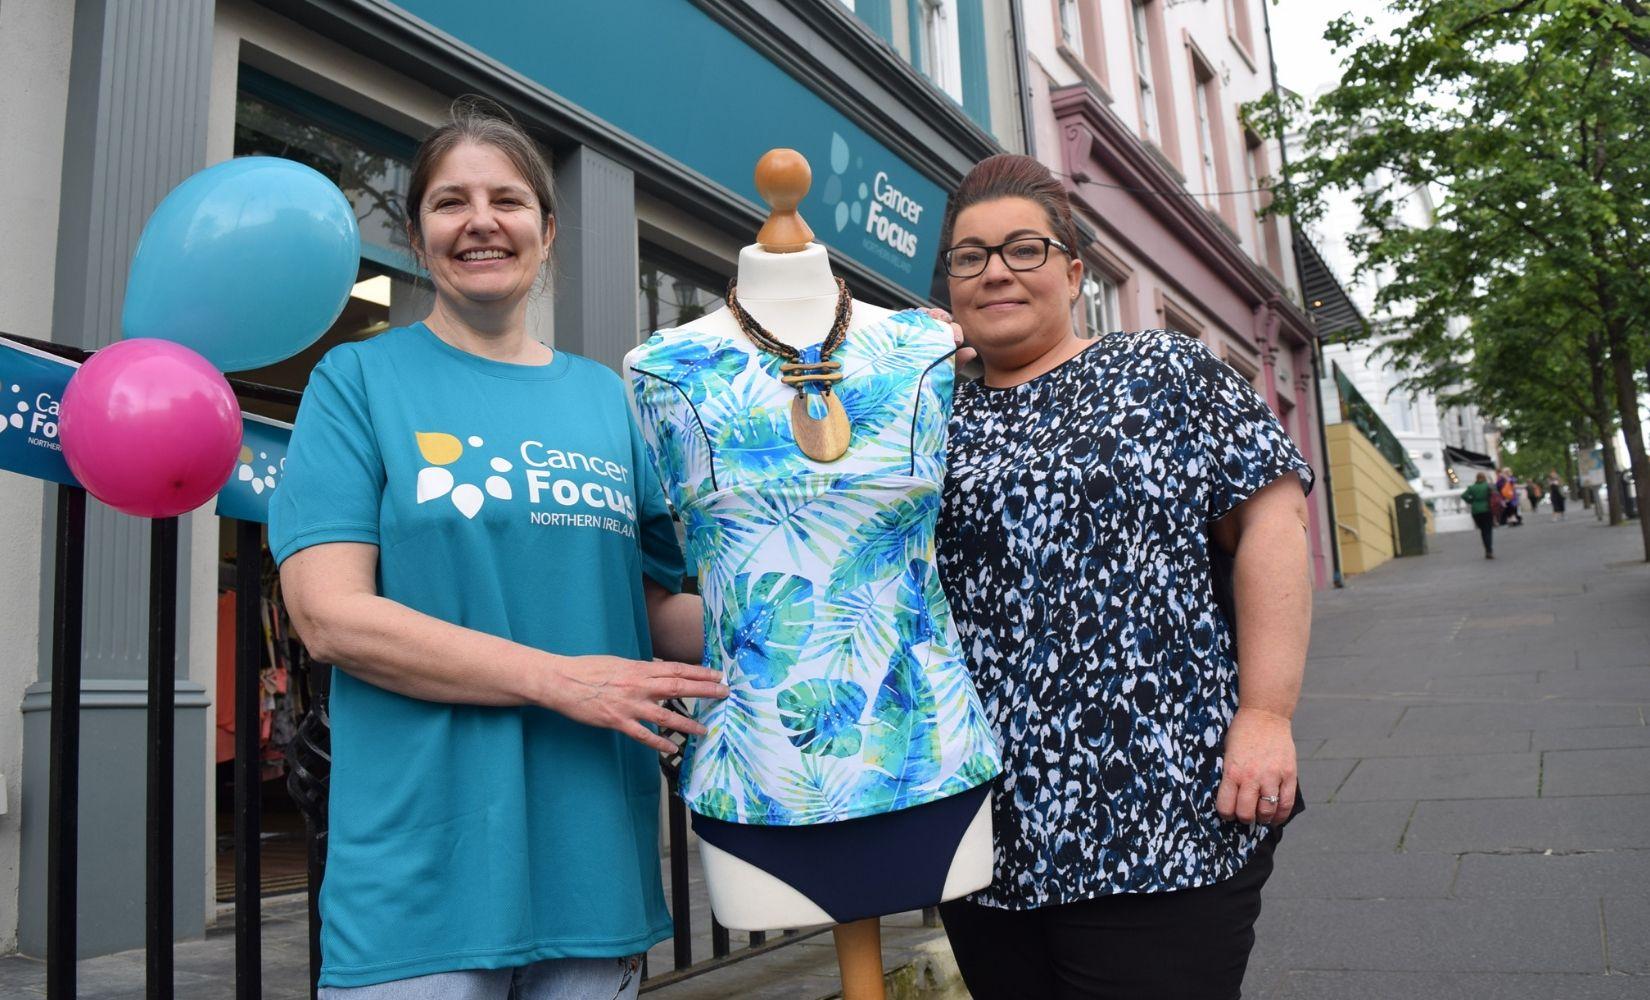 New city centre bra-fitting service